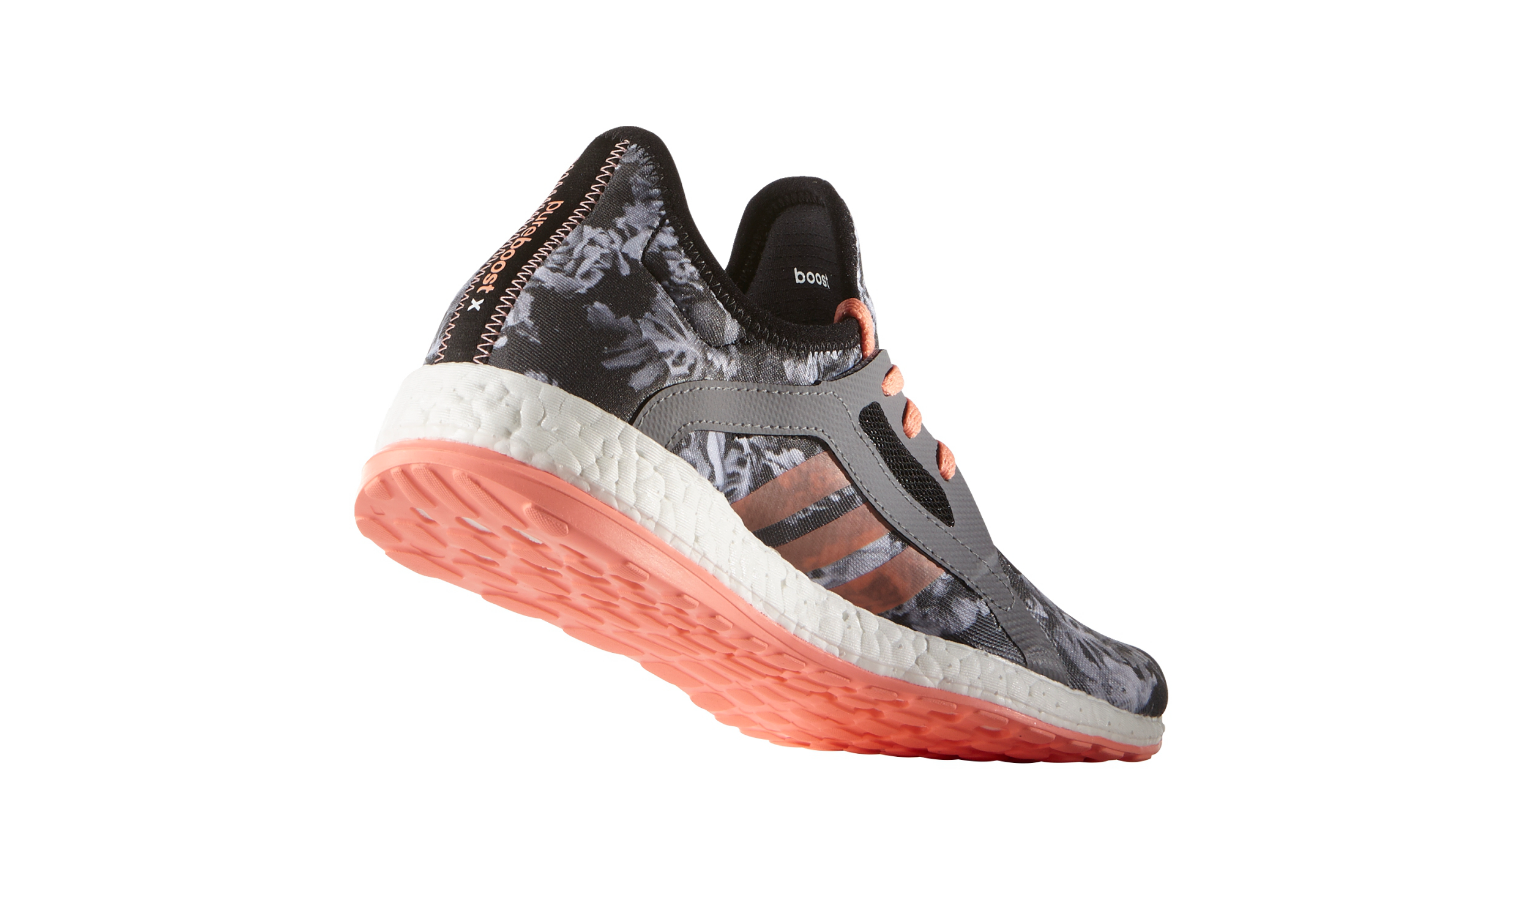 25014b2b41e Dámské běžecké boty adidas PURE BOOST X šedé